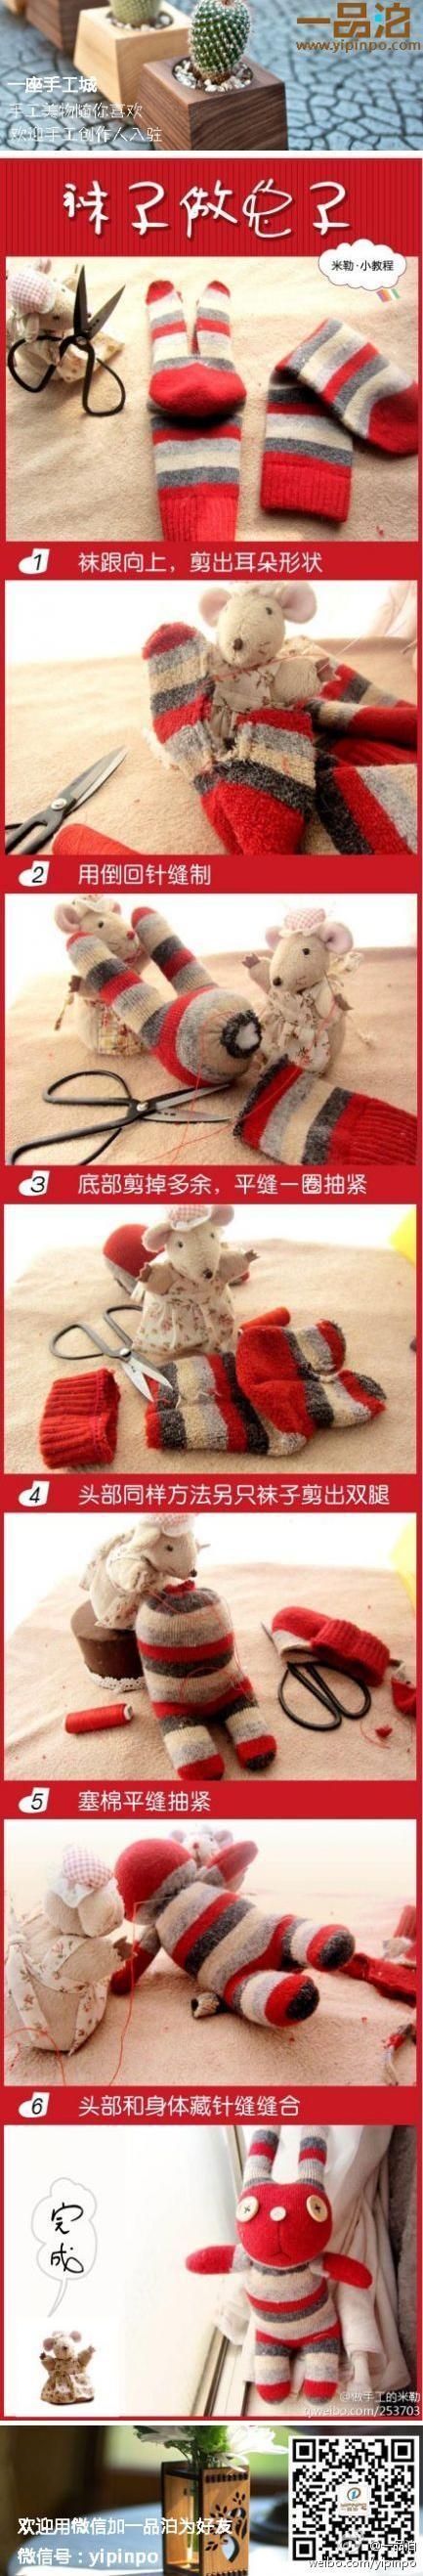 DIY袜子娃娃的教程